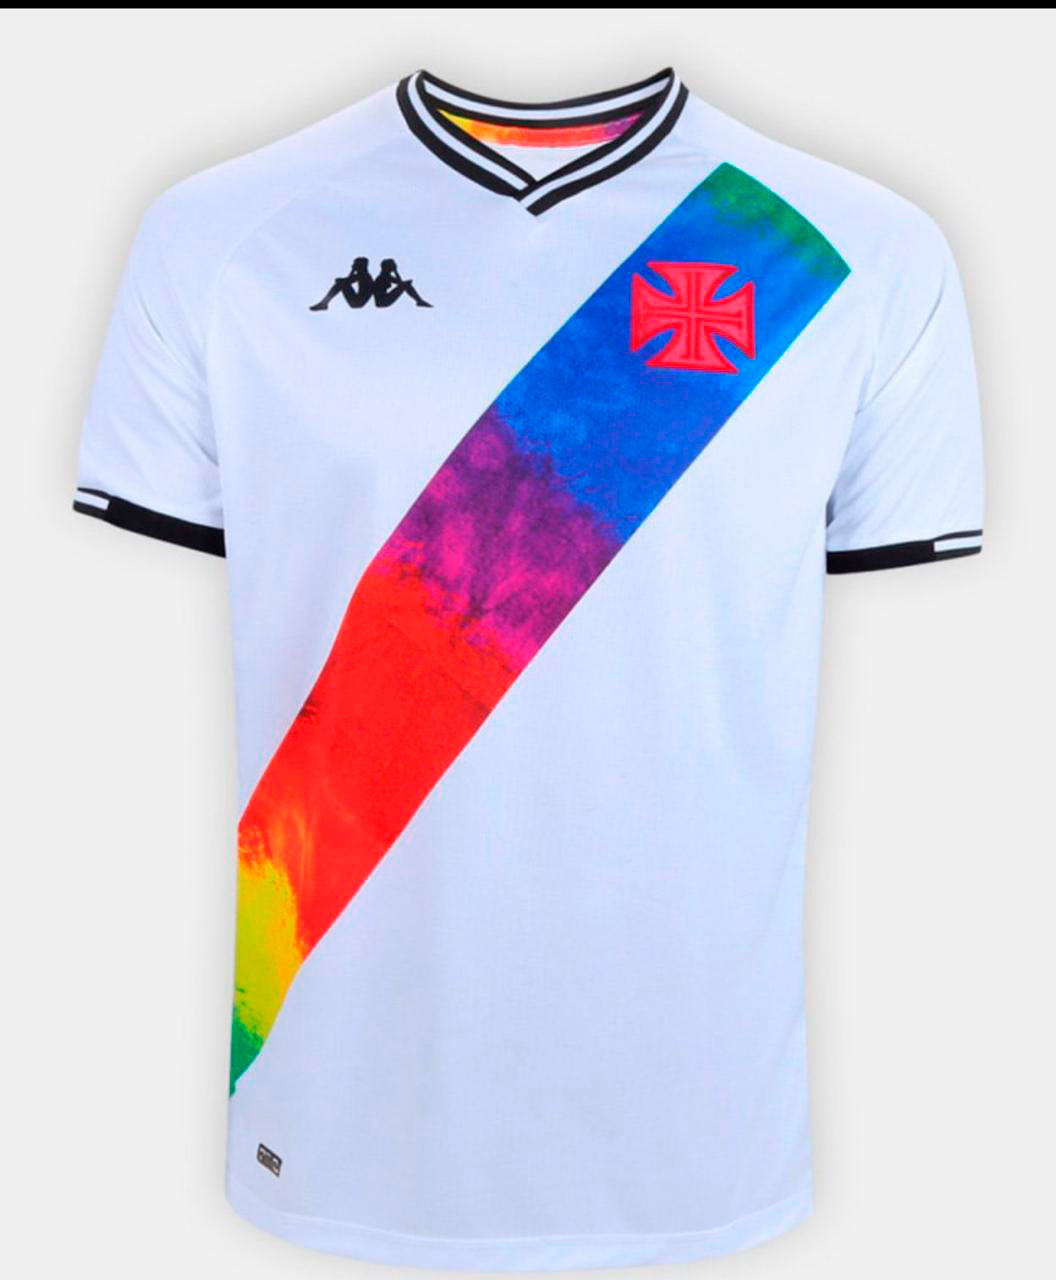 CAMISA ORGULHO LGBTQIA+ PLUS SIZE BRANCA - KAPPA